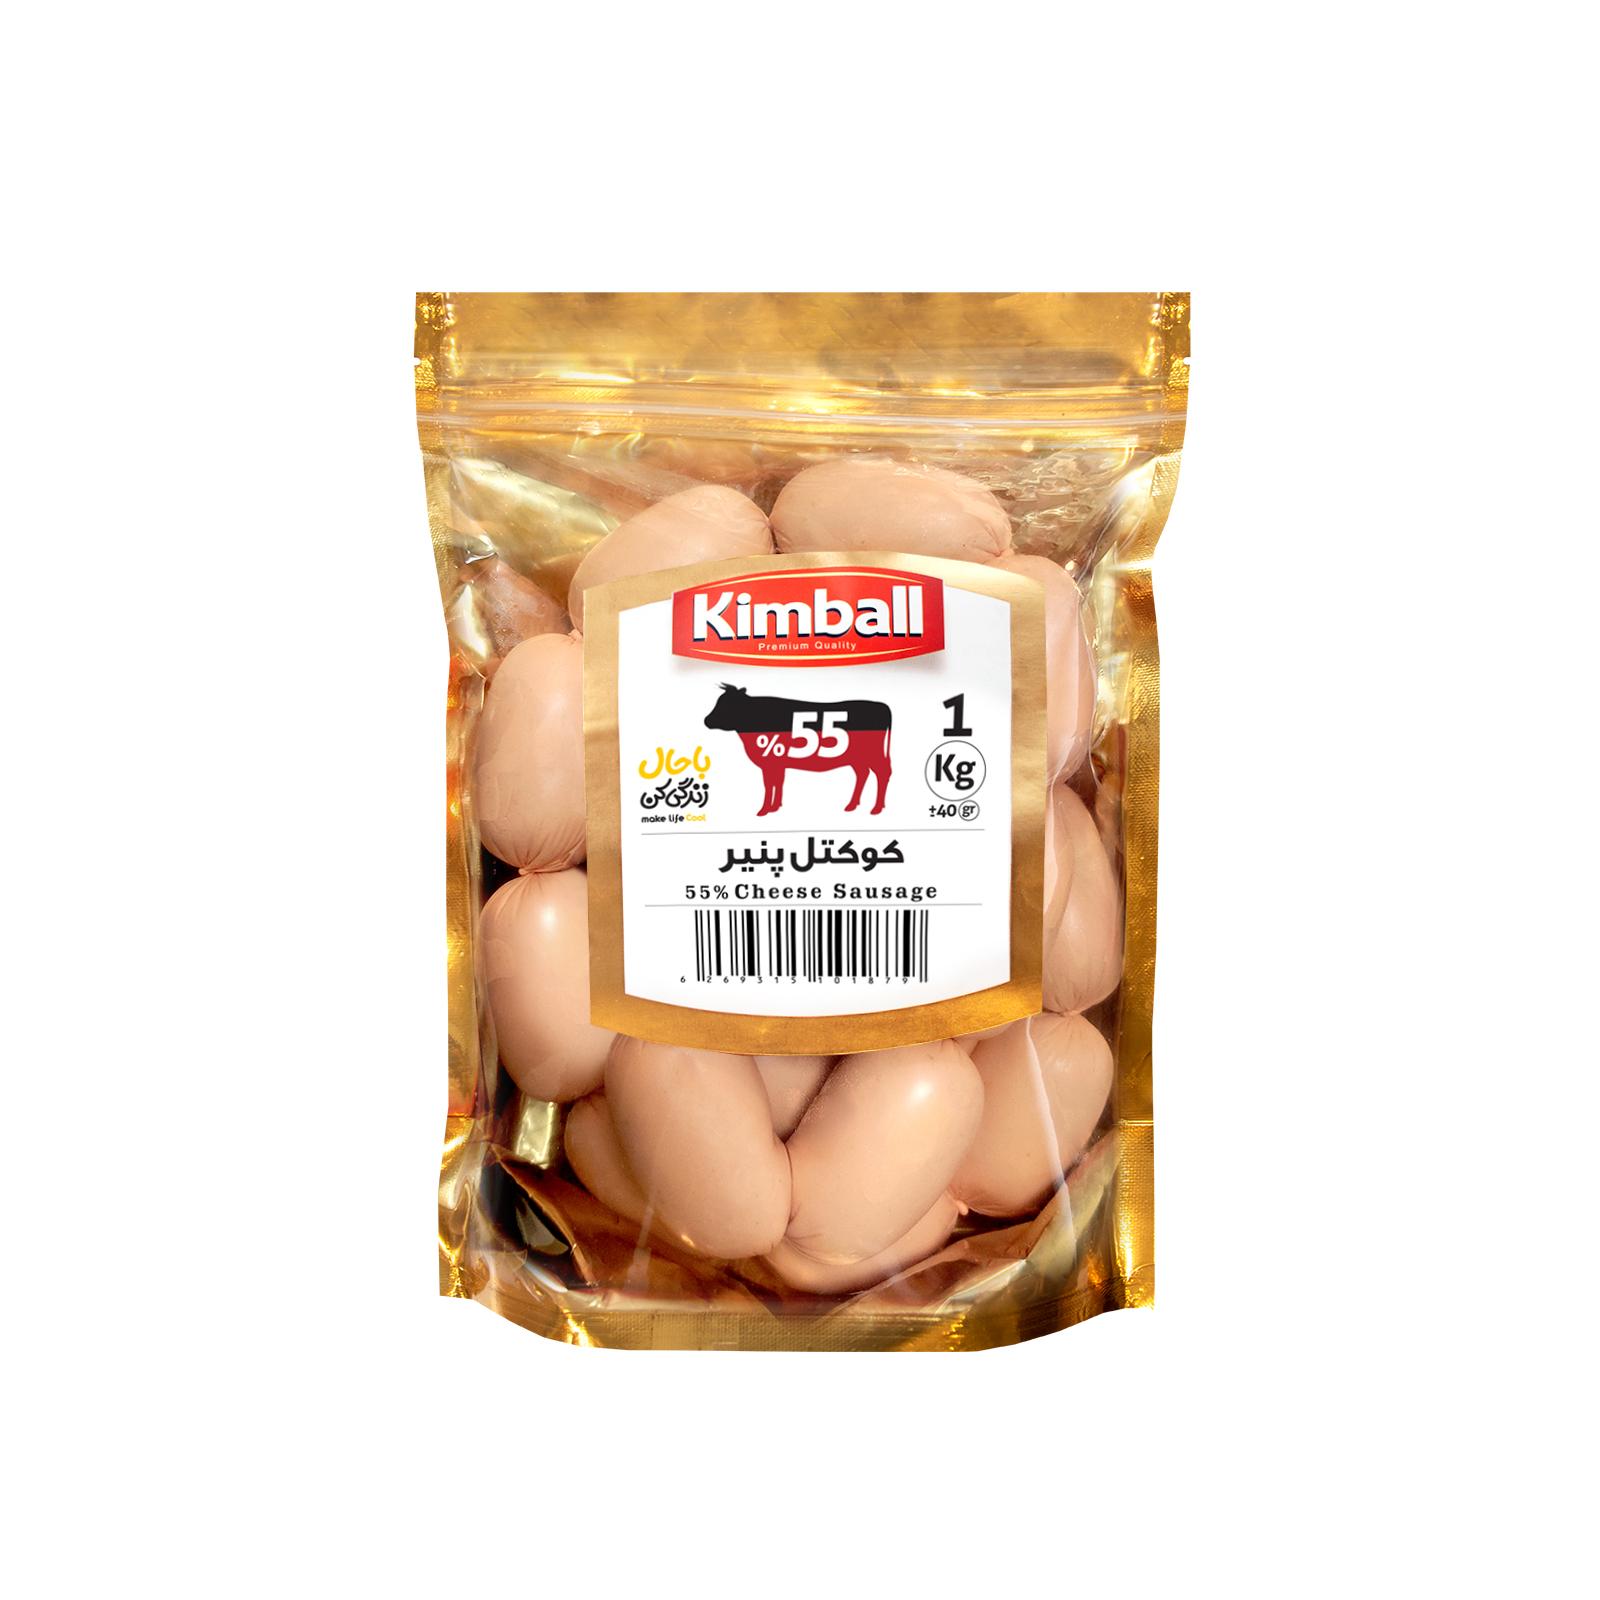 کوکتل 55 درصد گوشت با پنیر کیمبال - 1 کیلوگرم